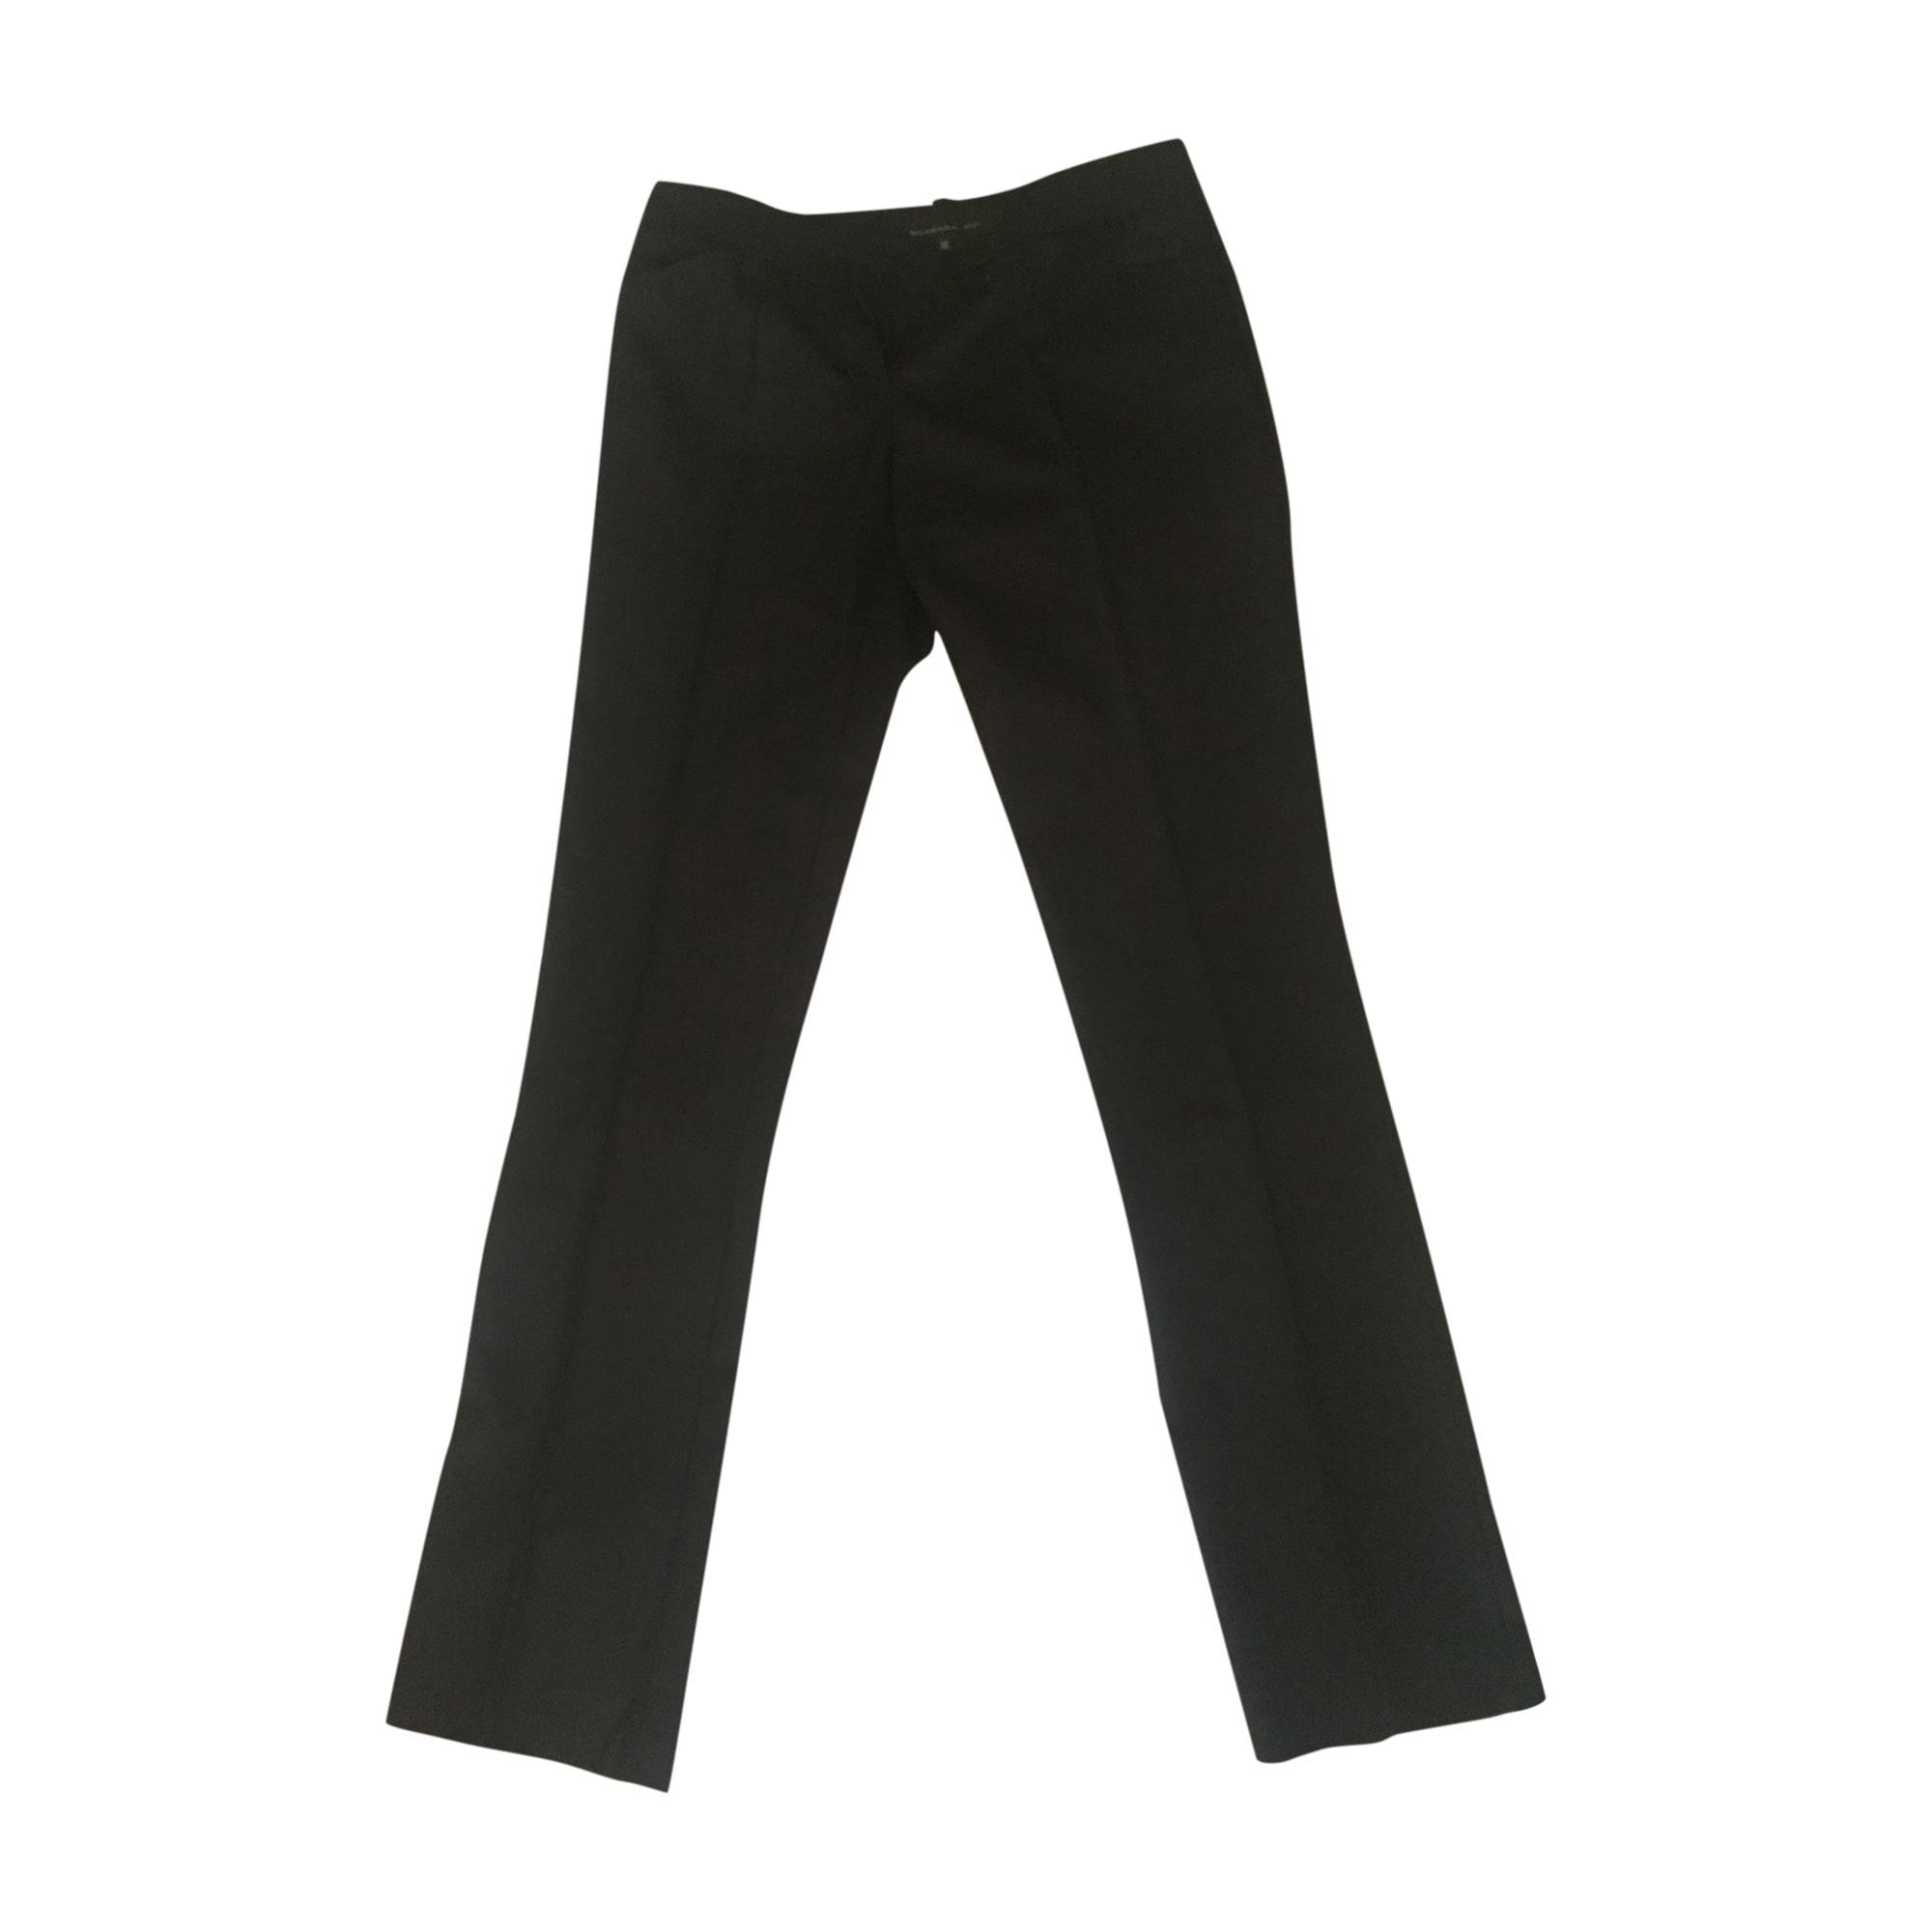 Tailleur pantalon BARBARA BUI 38 (M 5a6b042c26d2